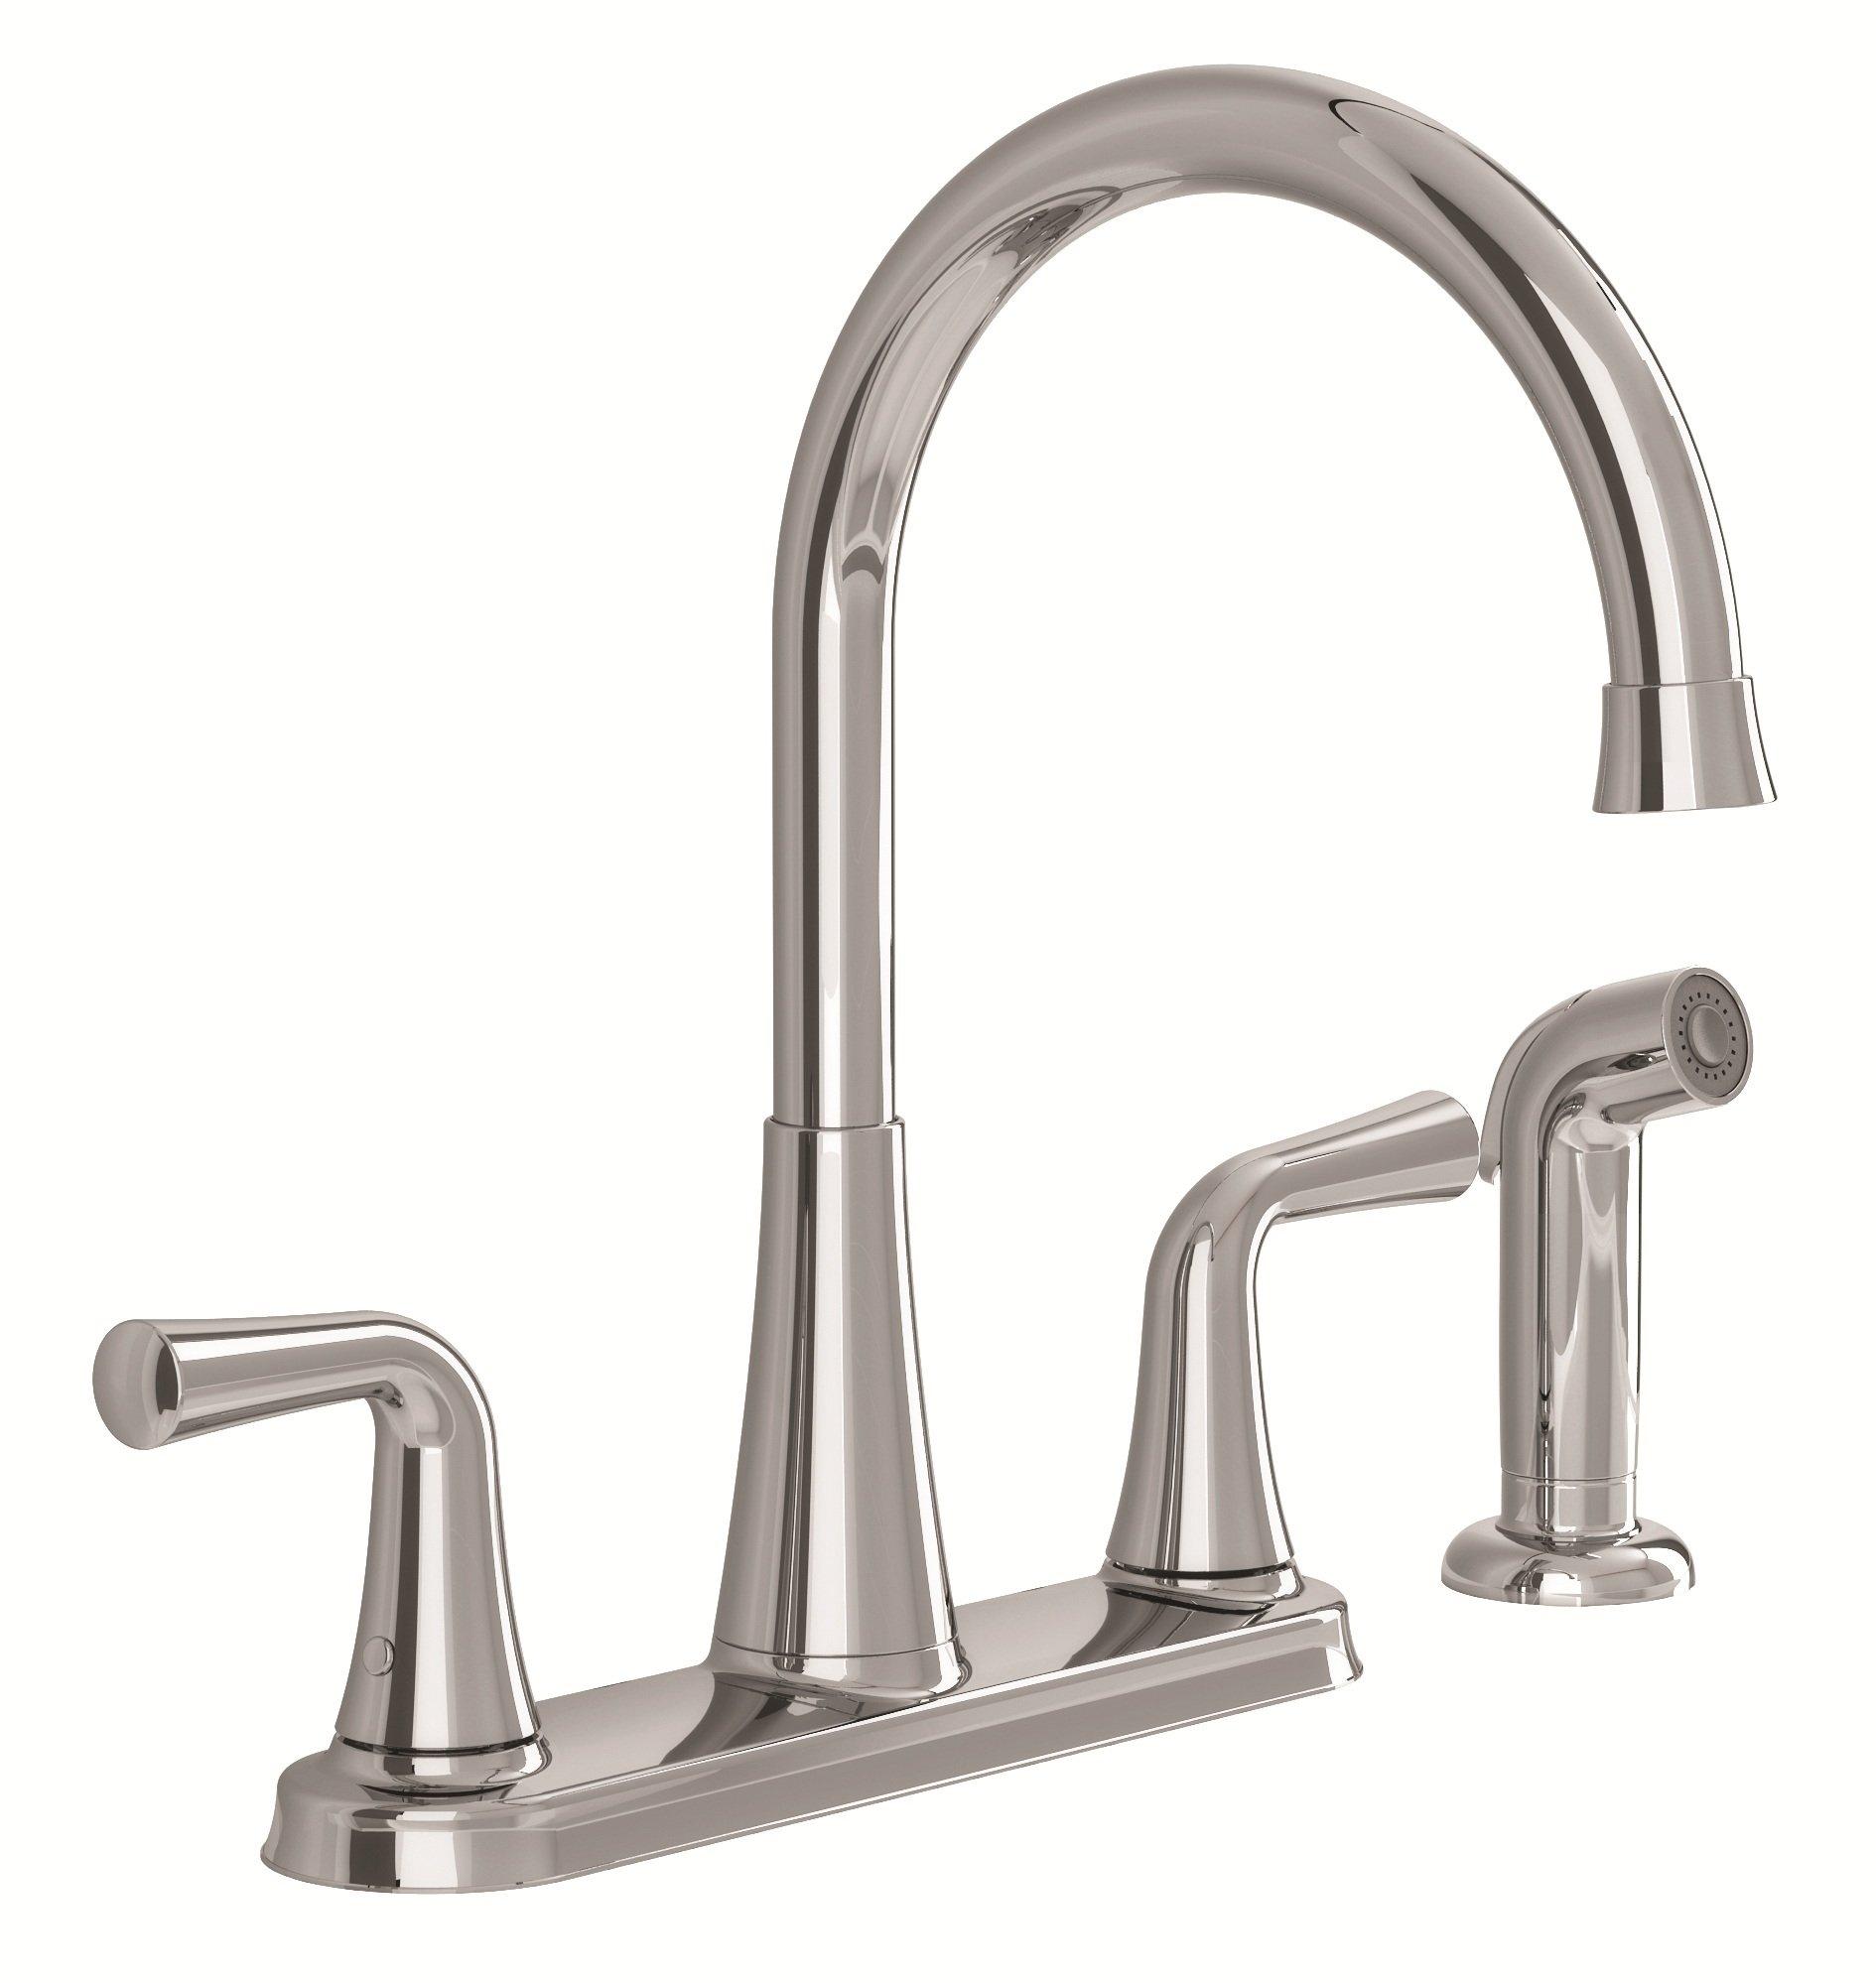 Moen Single Handle Kitchen Faucet Loose